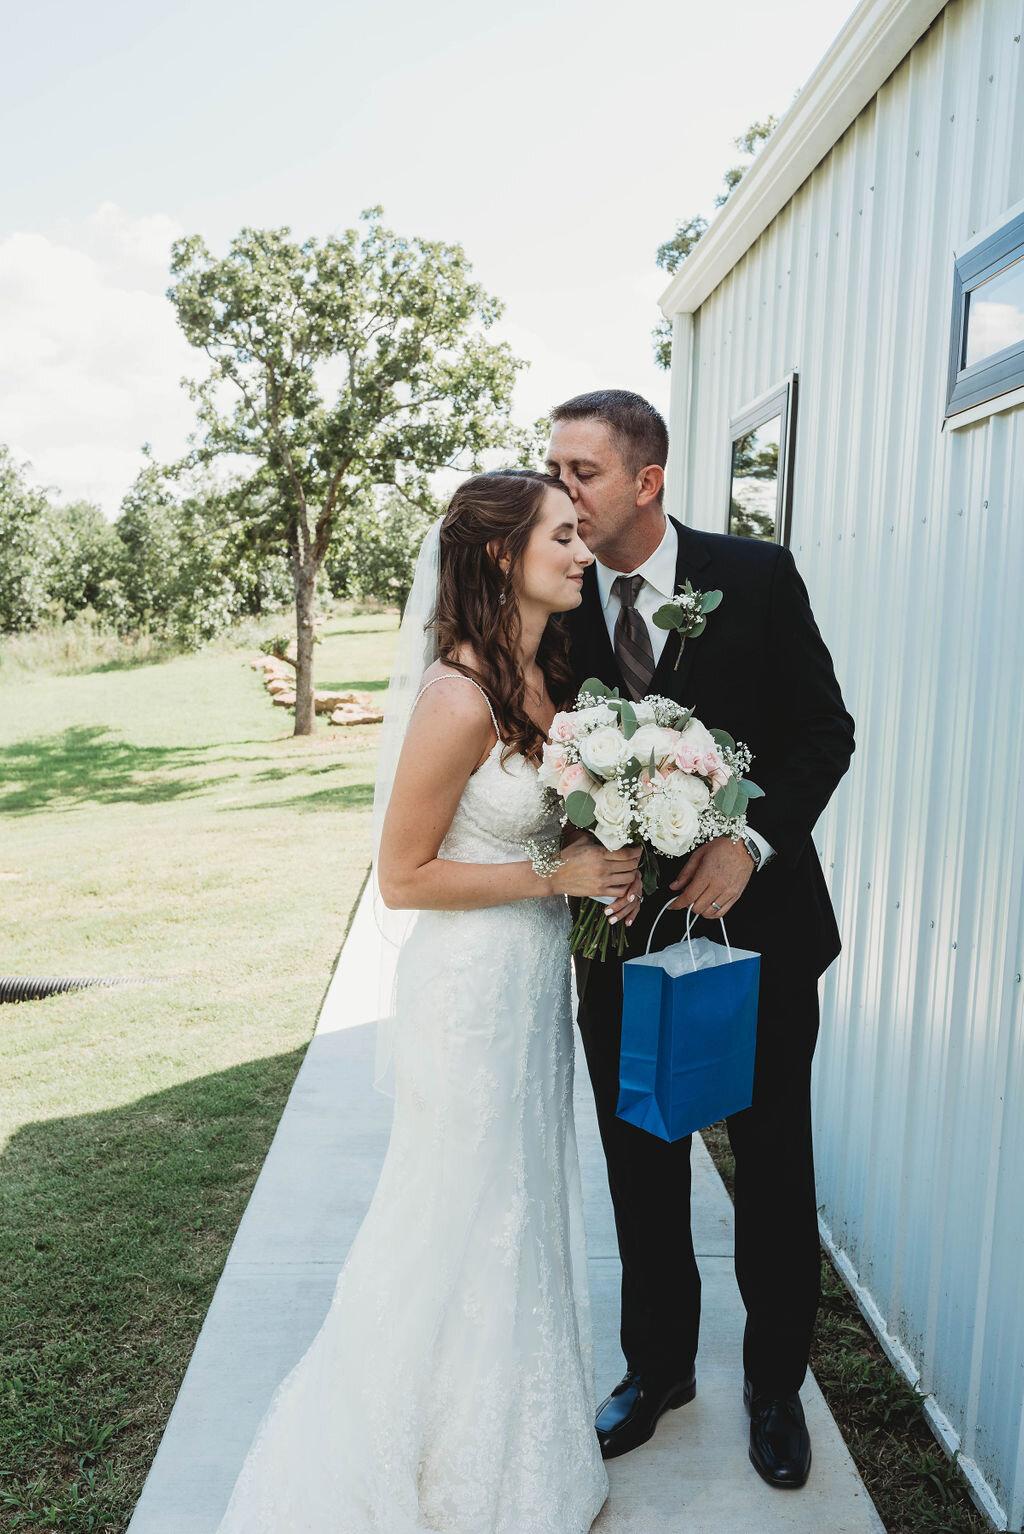 Tulsa Wedding Venue with a View 3.jpg